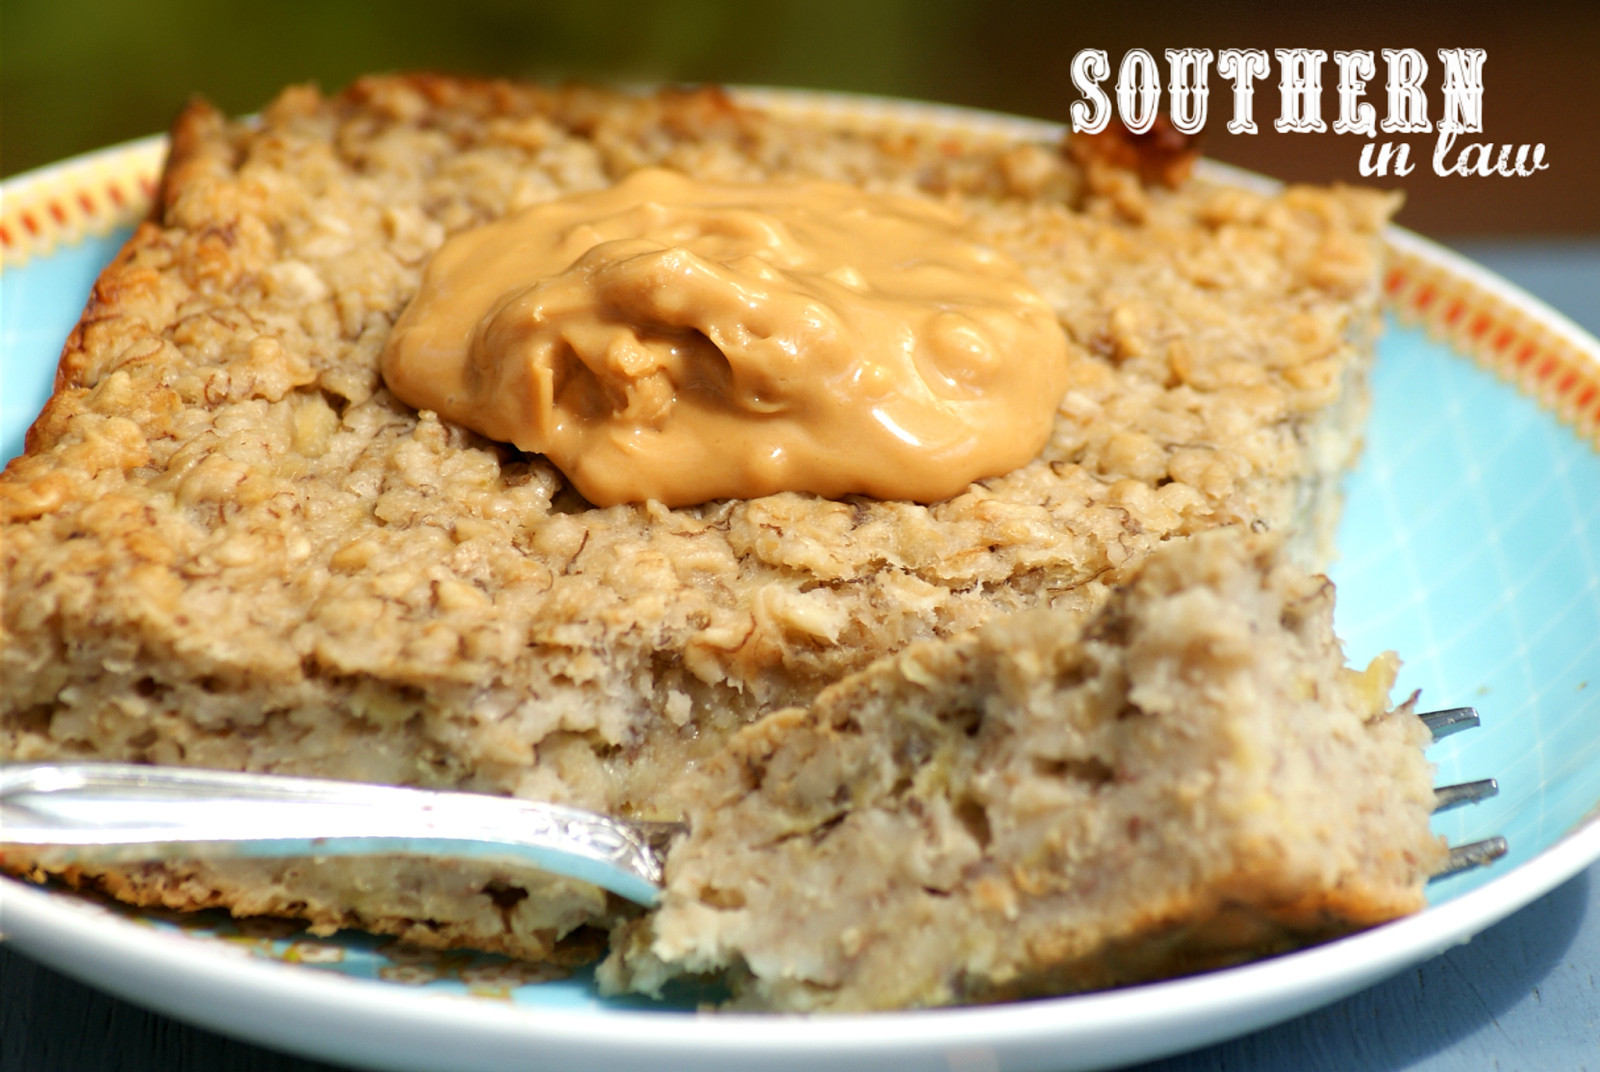 Healthy Banana Oatmeal Bread  Southern In Law Recipe Banana Bread Baked Oatmeal